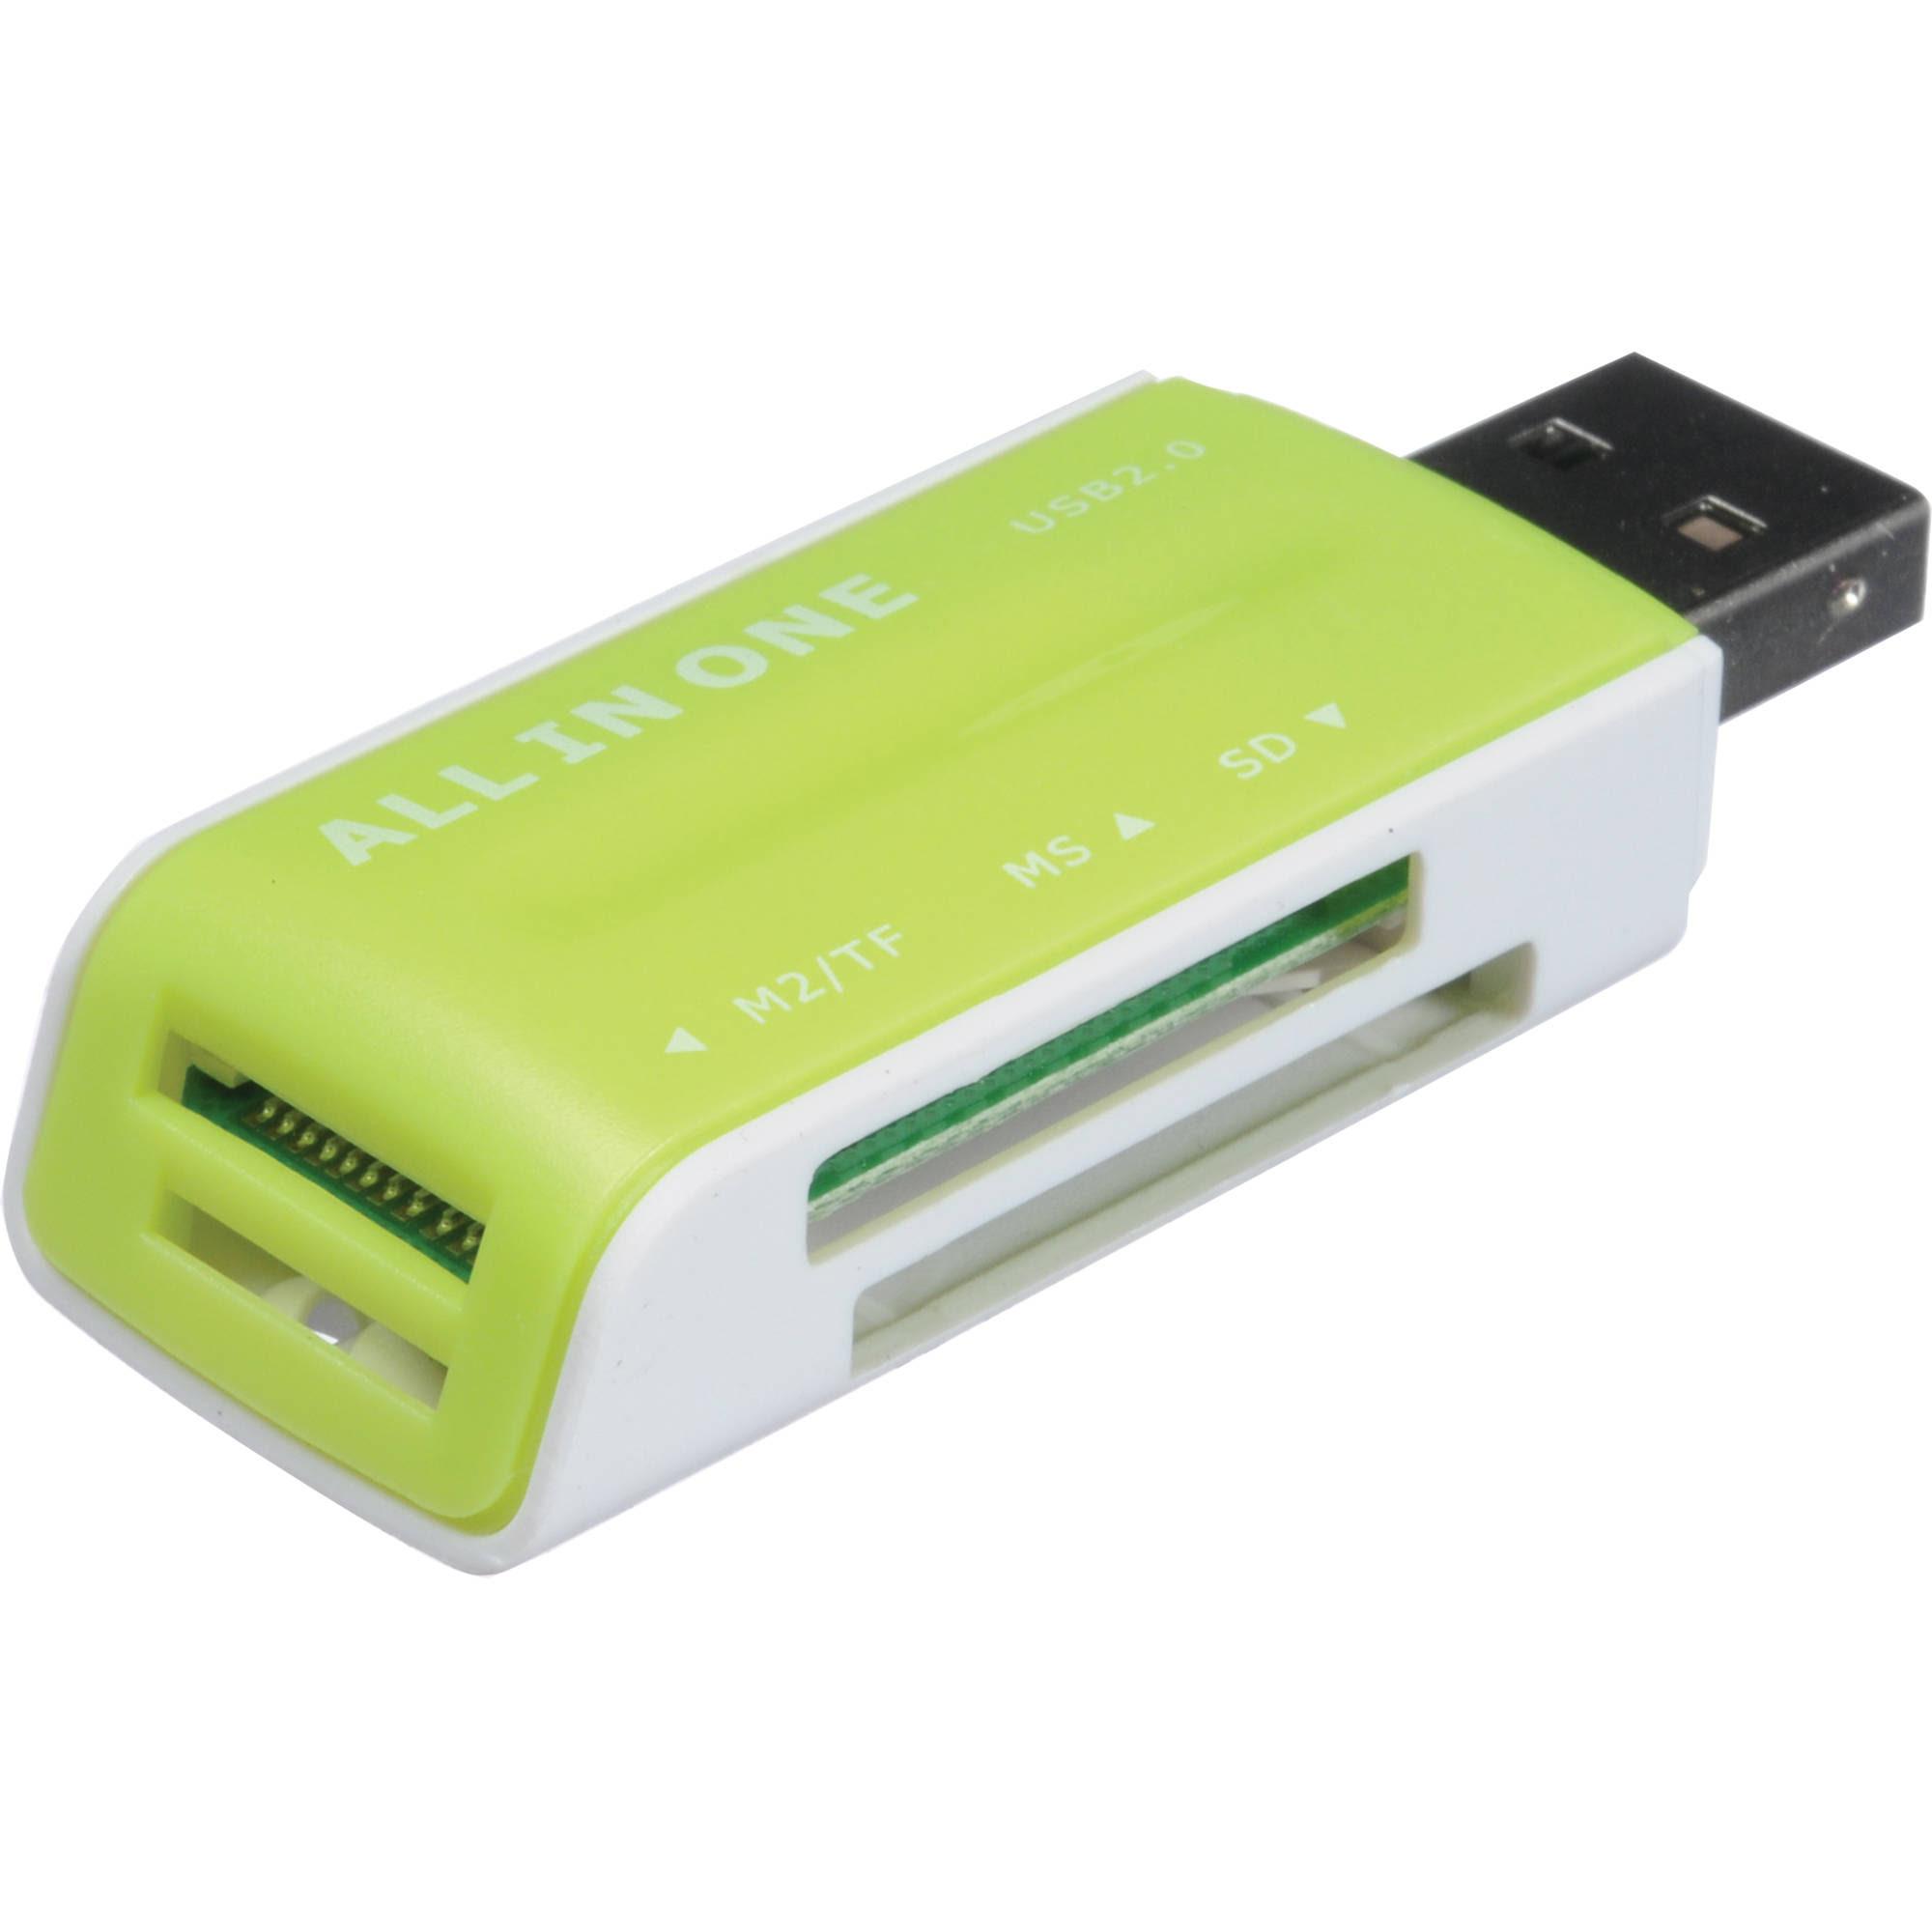 GGI_SDHC_Secure_Digital_SD_SDHC_502433